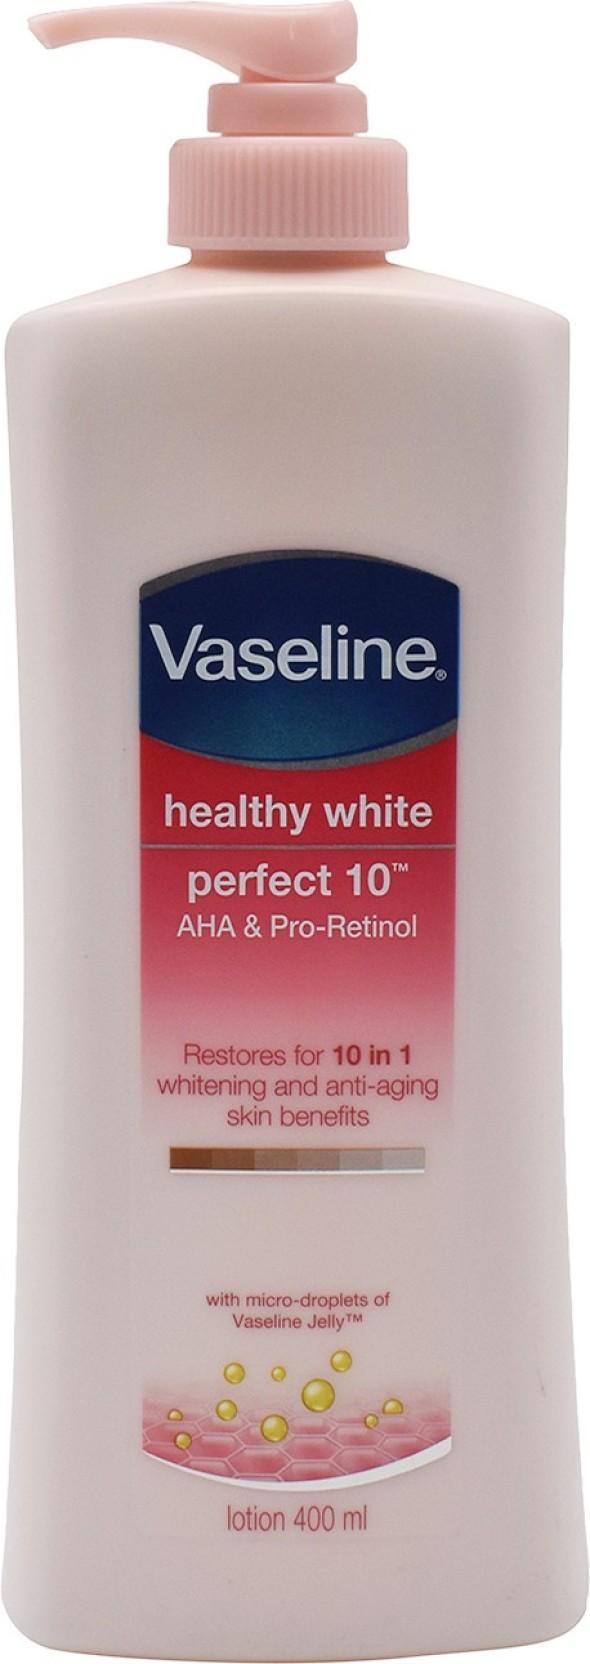 Vaseline Healthy White Perfect 10 Aha Pro Retinol Lotion 400ml Home